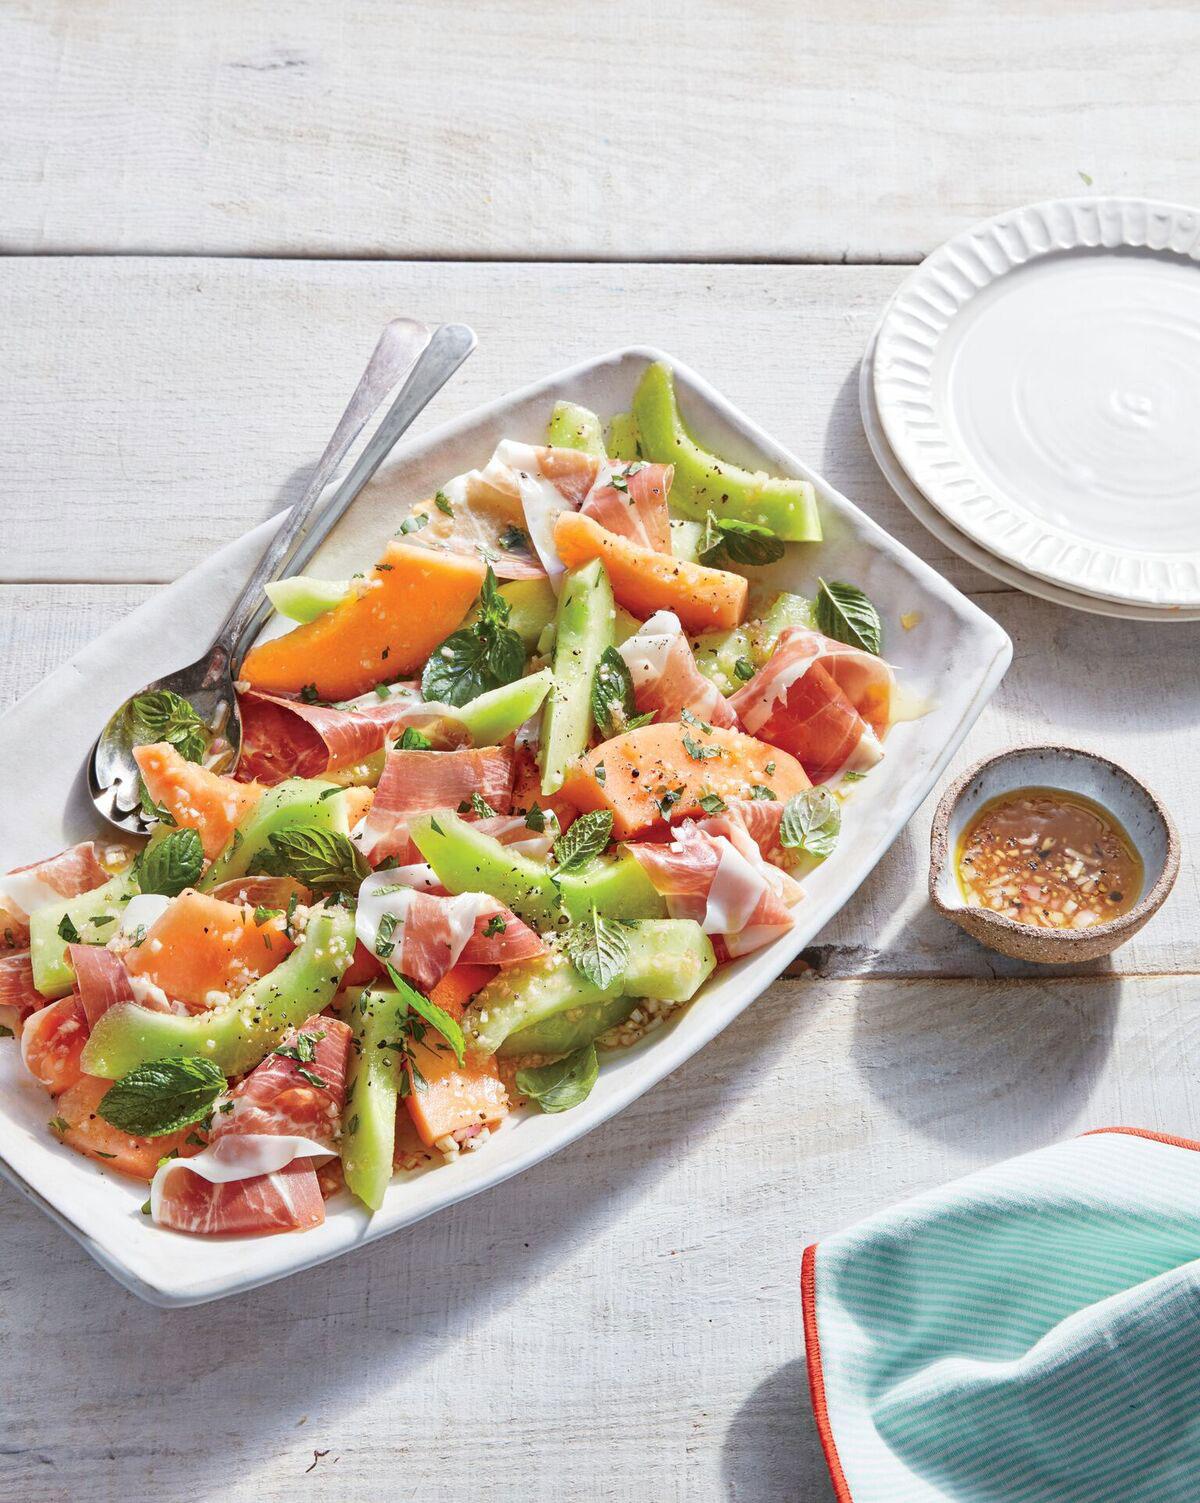 summer-melon-salad-with-ham-and-mint-vinaigrette